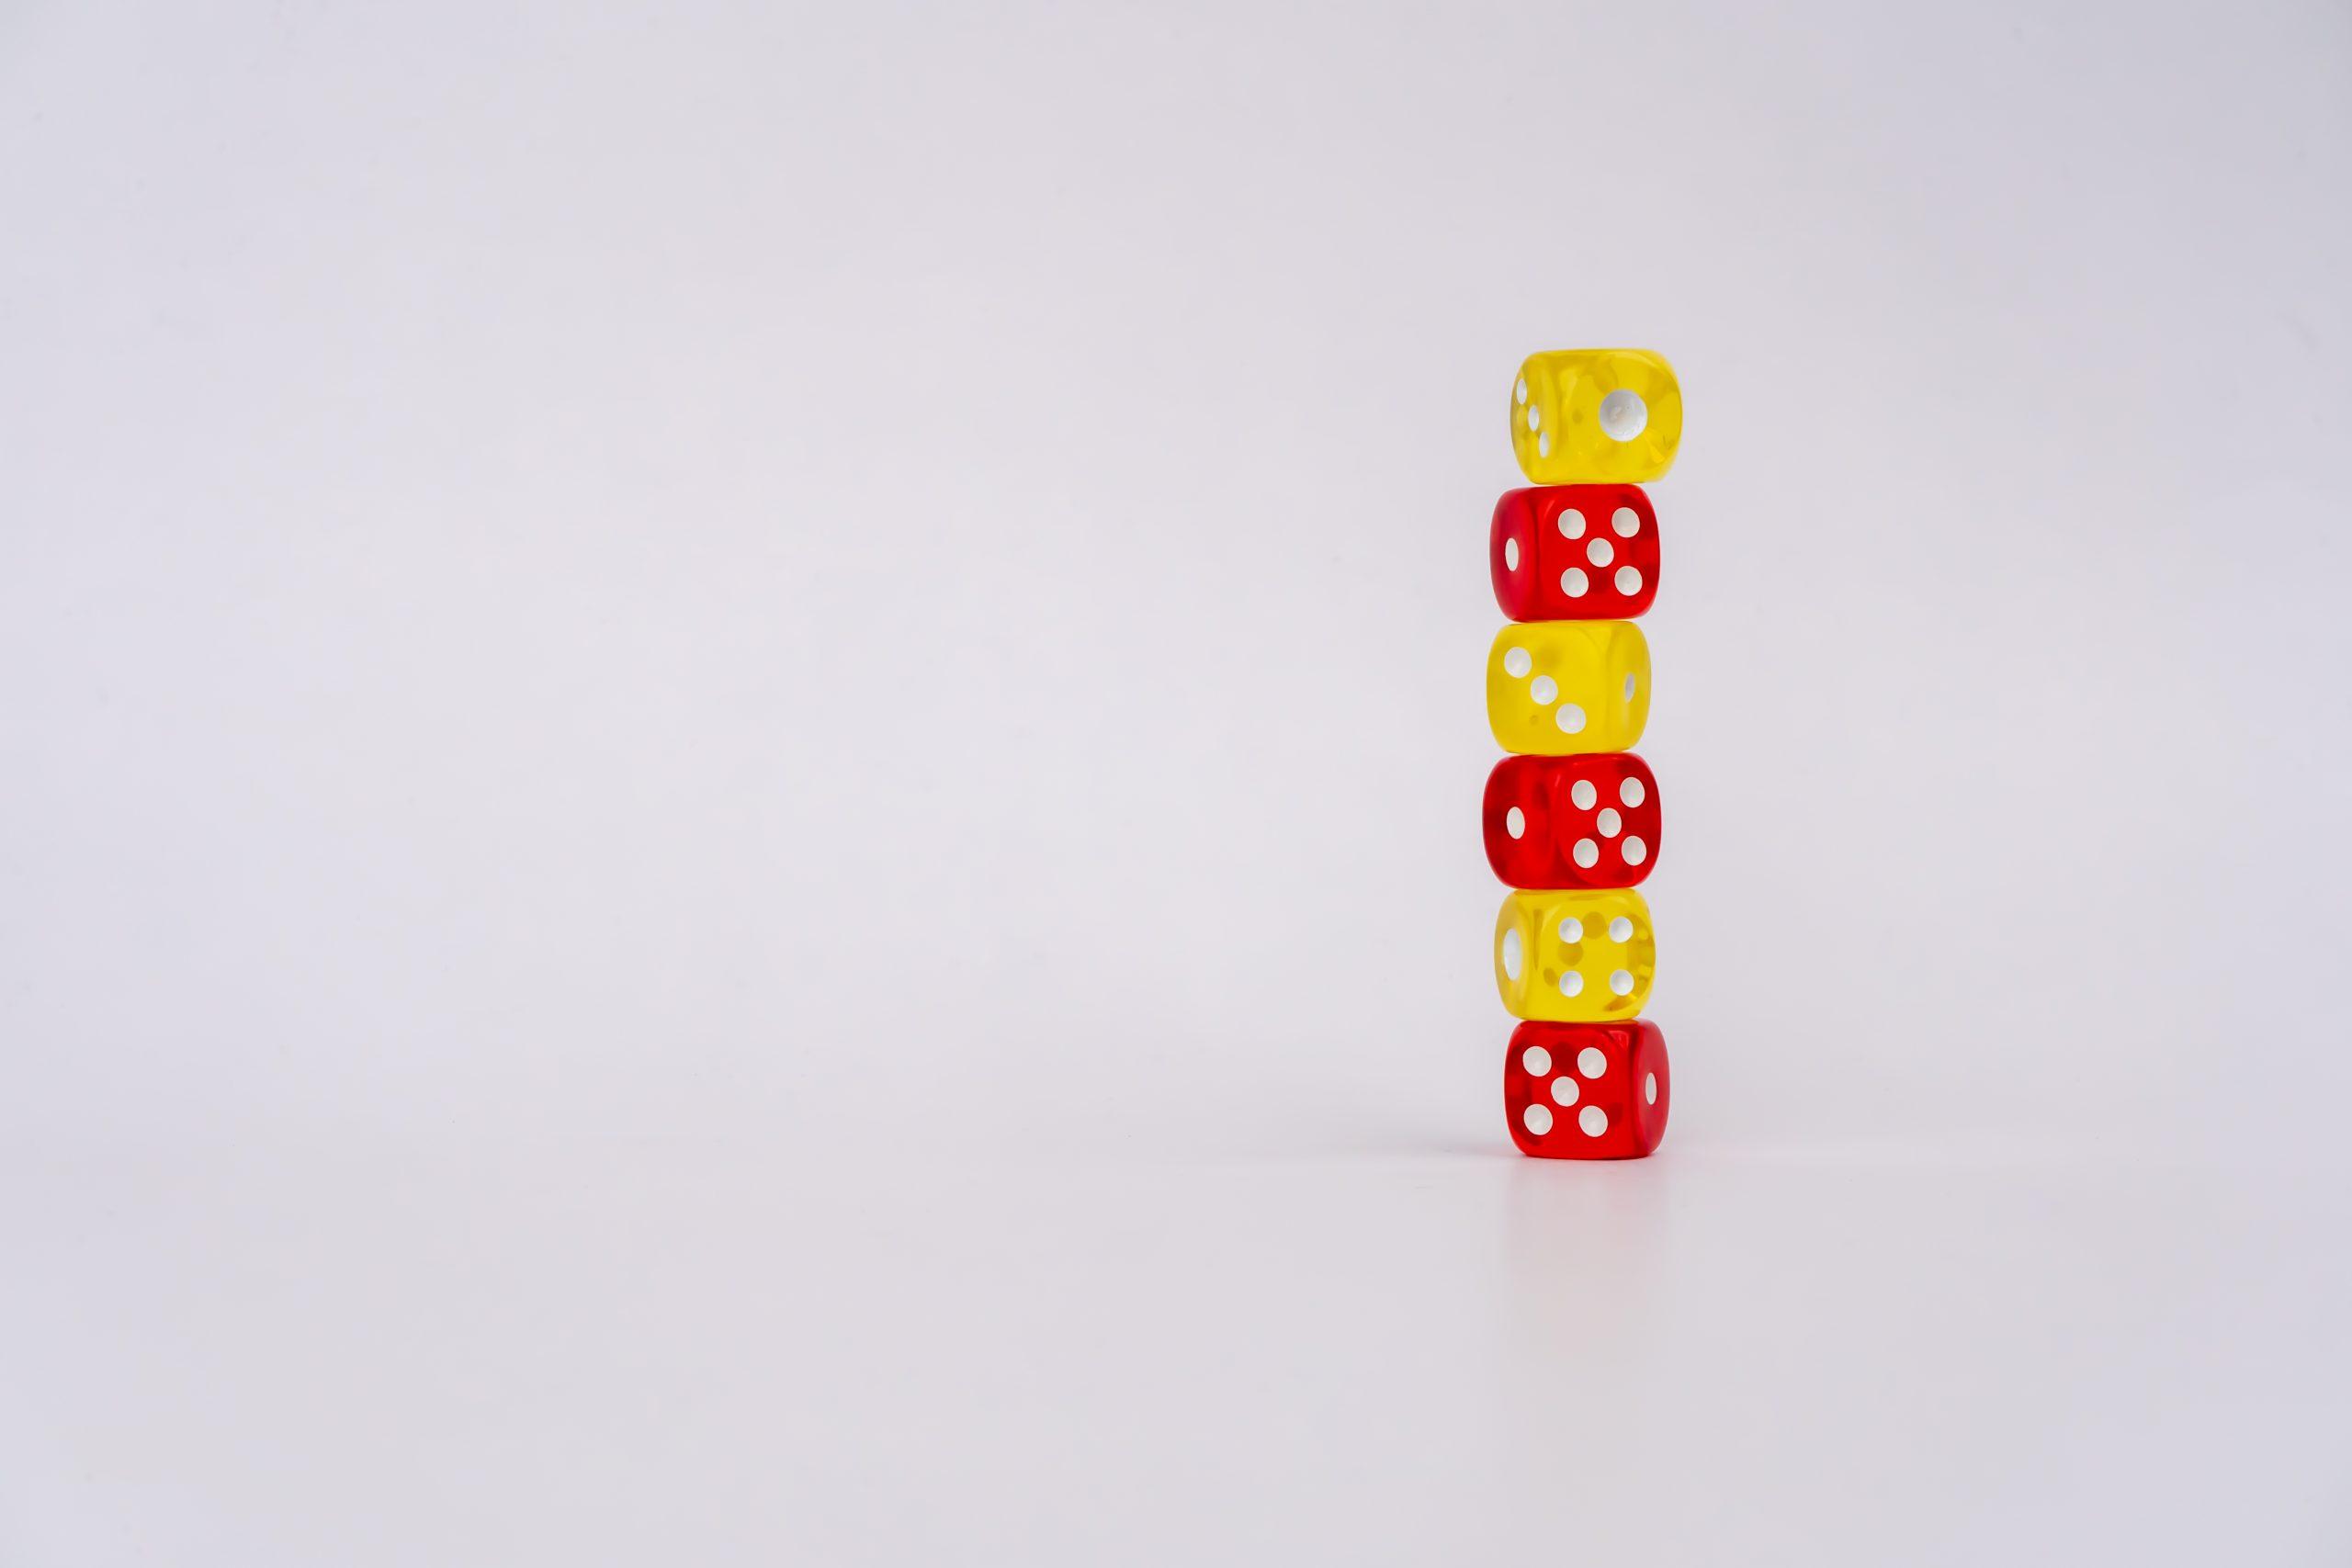 red an yellow dice balancing